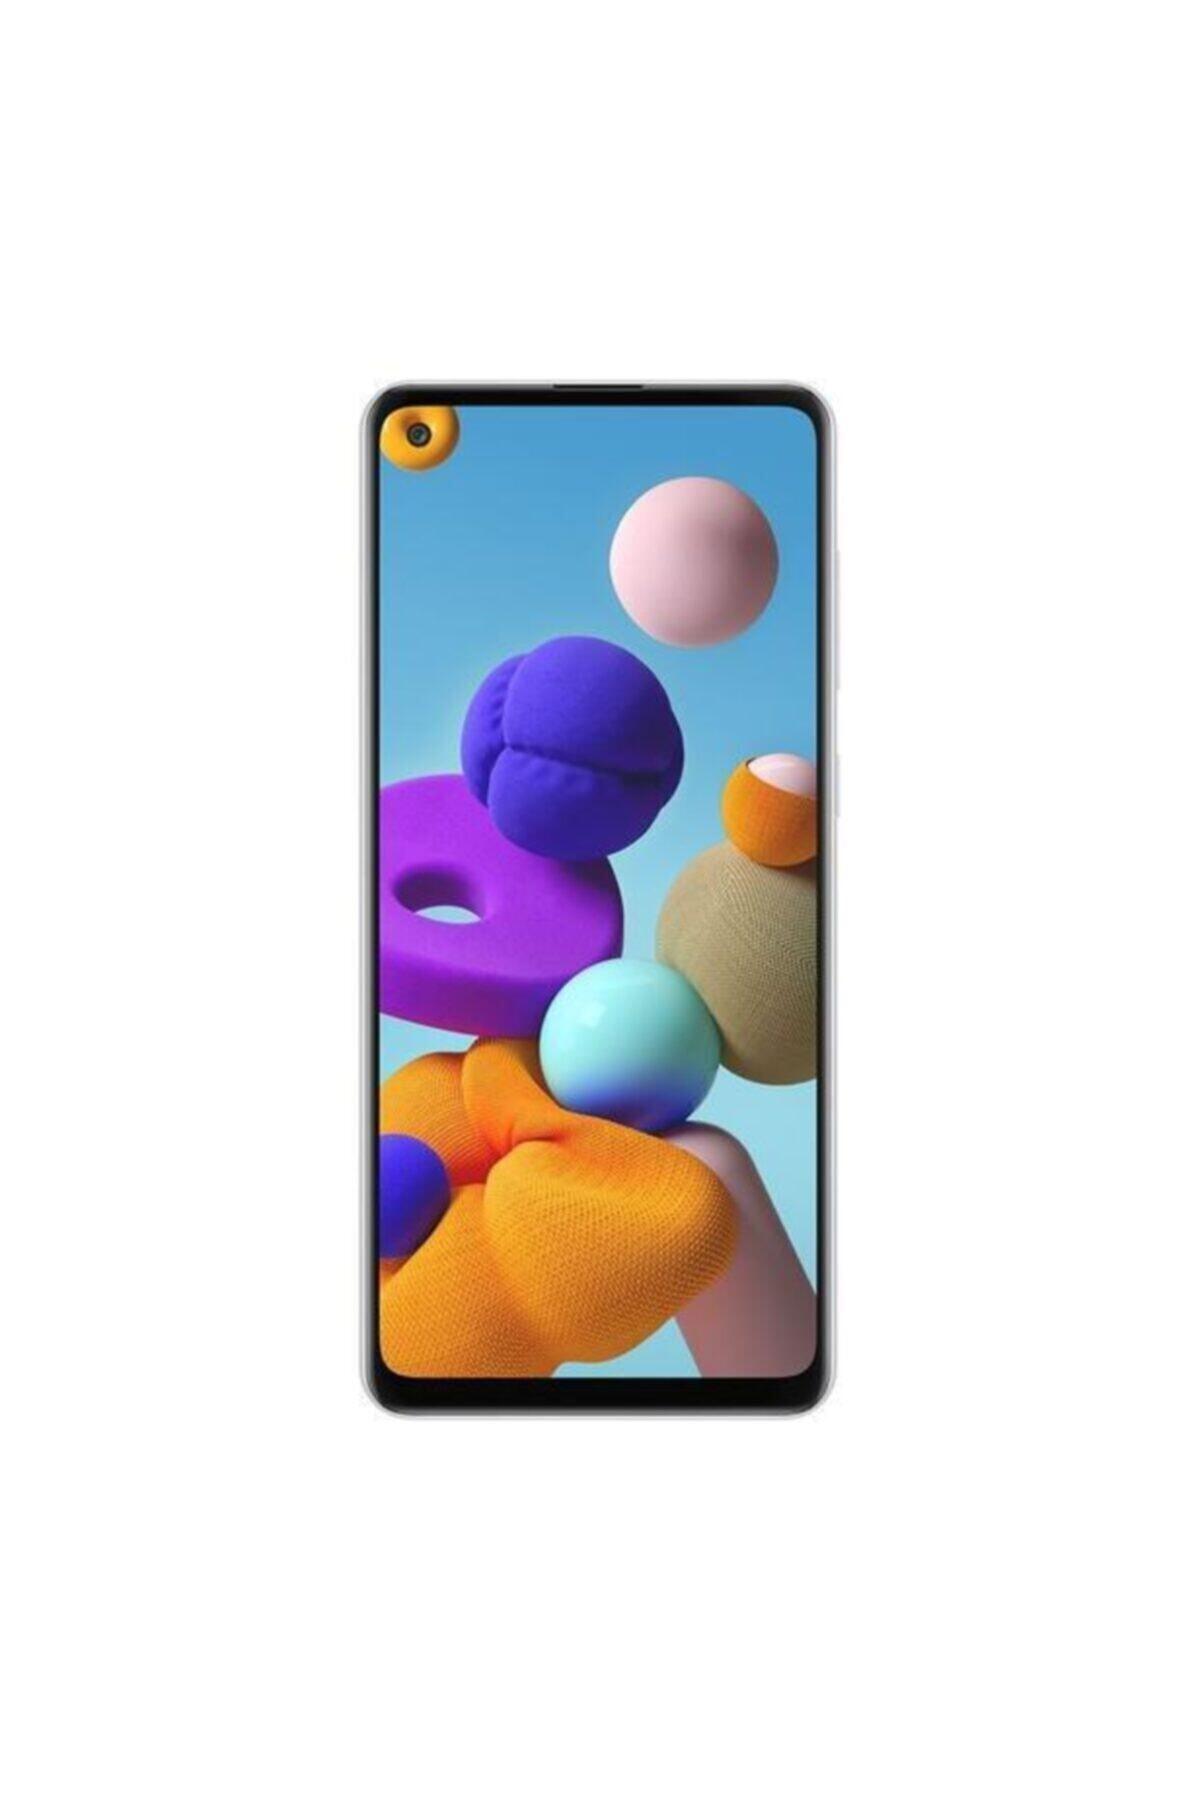 Galaxy A21s 128GB Beyaz Cep Telefonu (Samsung Türkiye Garantili)